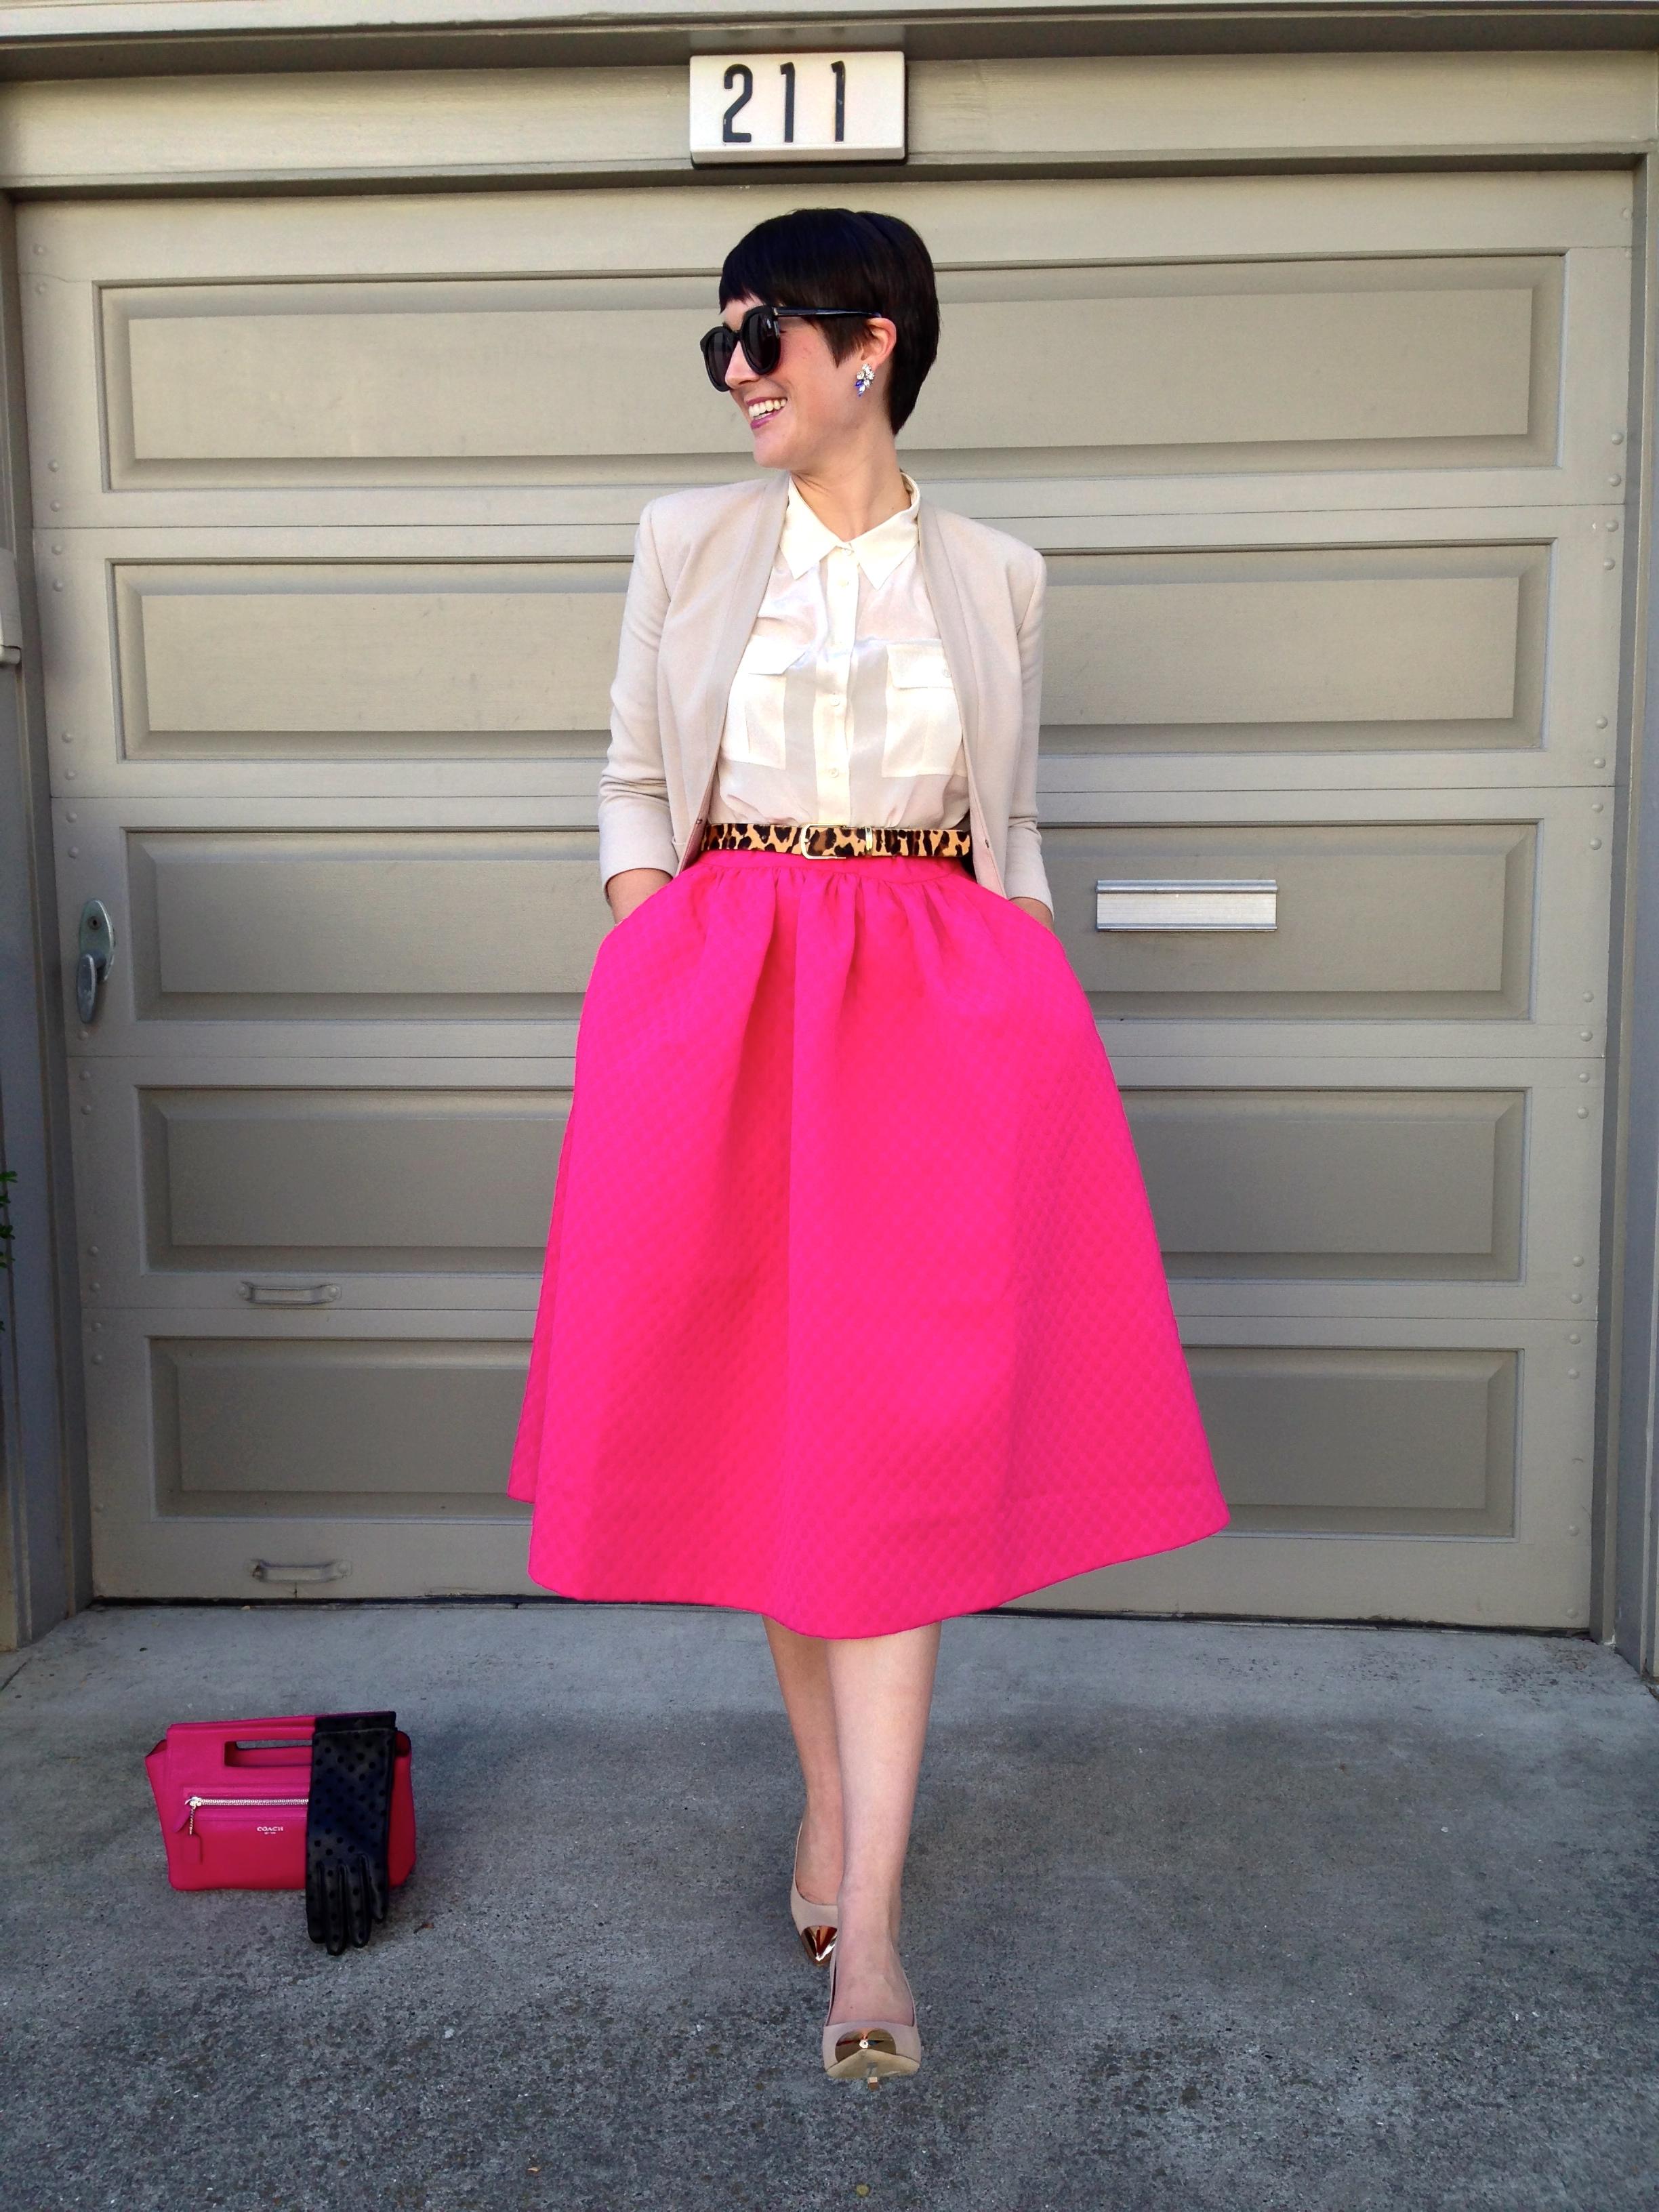 I Dream Of Midi Skirts. – Wannabe Fashion Blogger